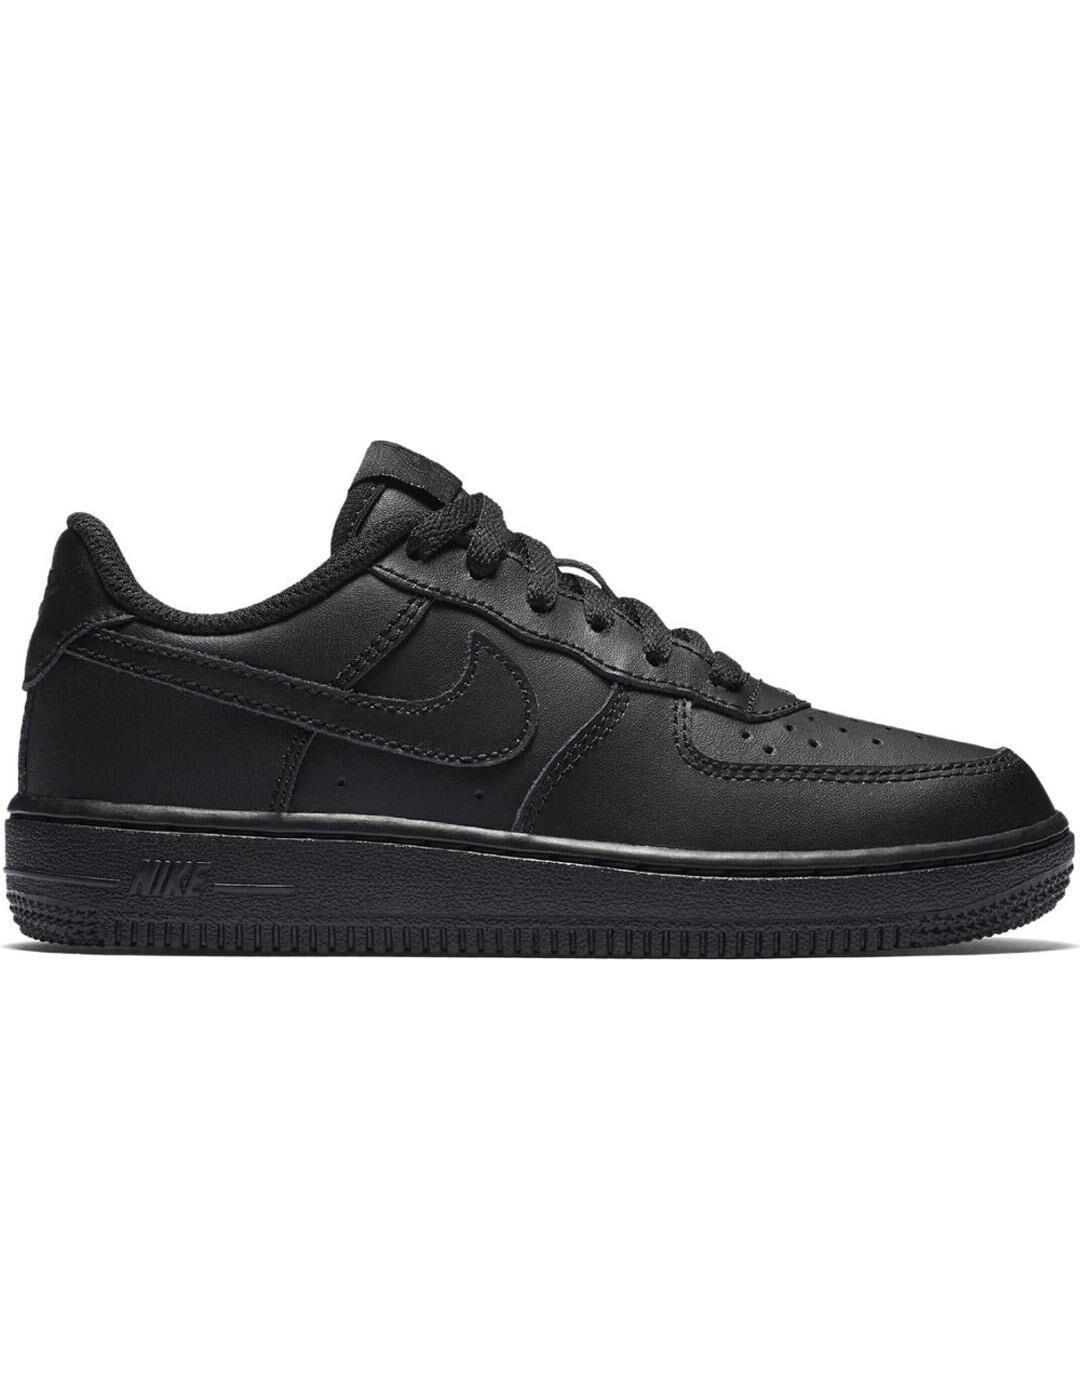 Nike Force 1 (Ps) Negro/negro Niño/a - 35